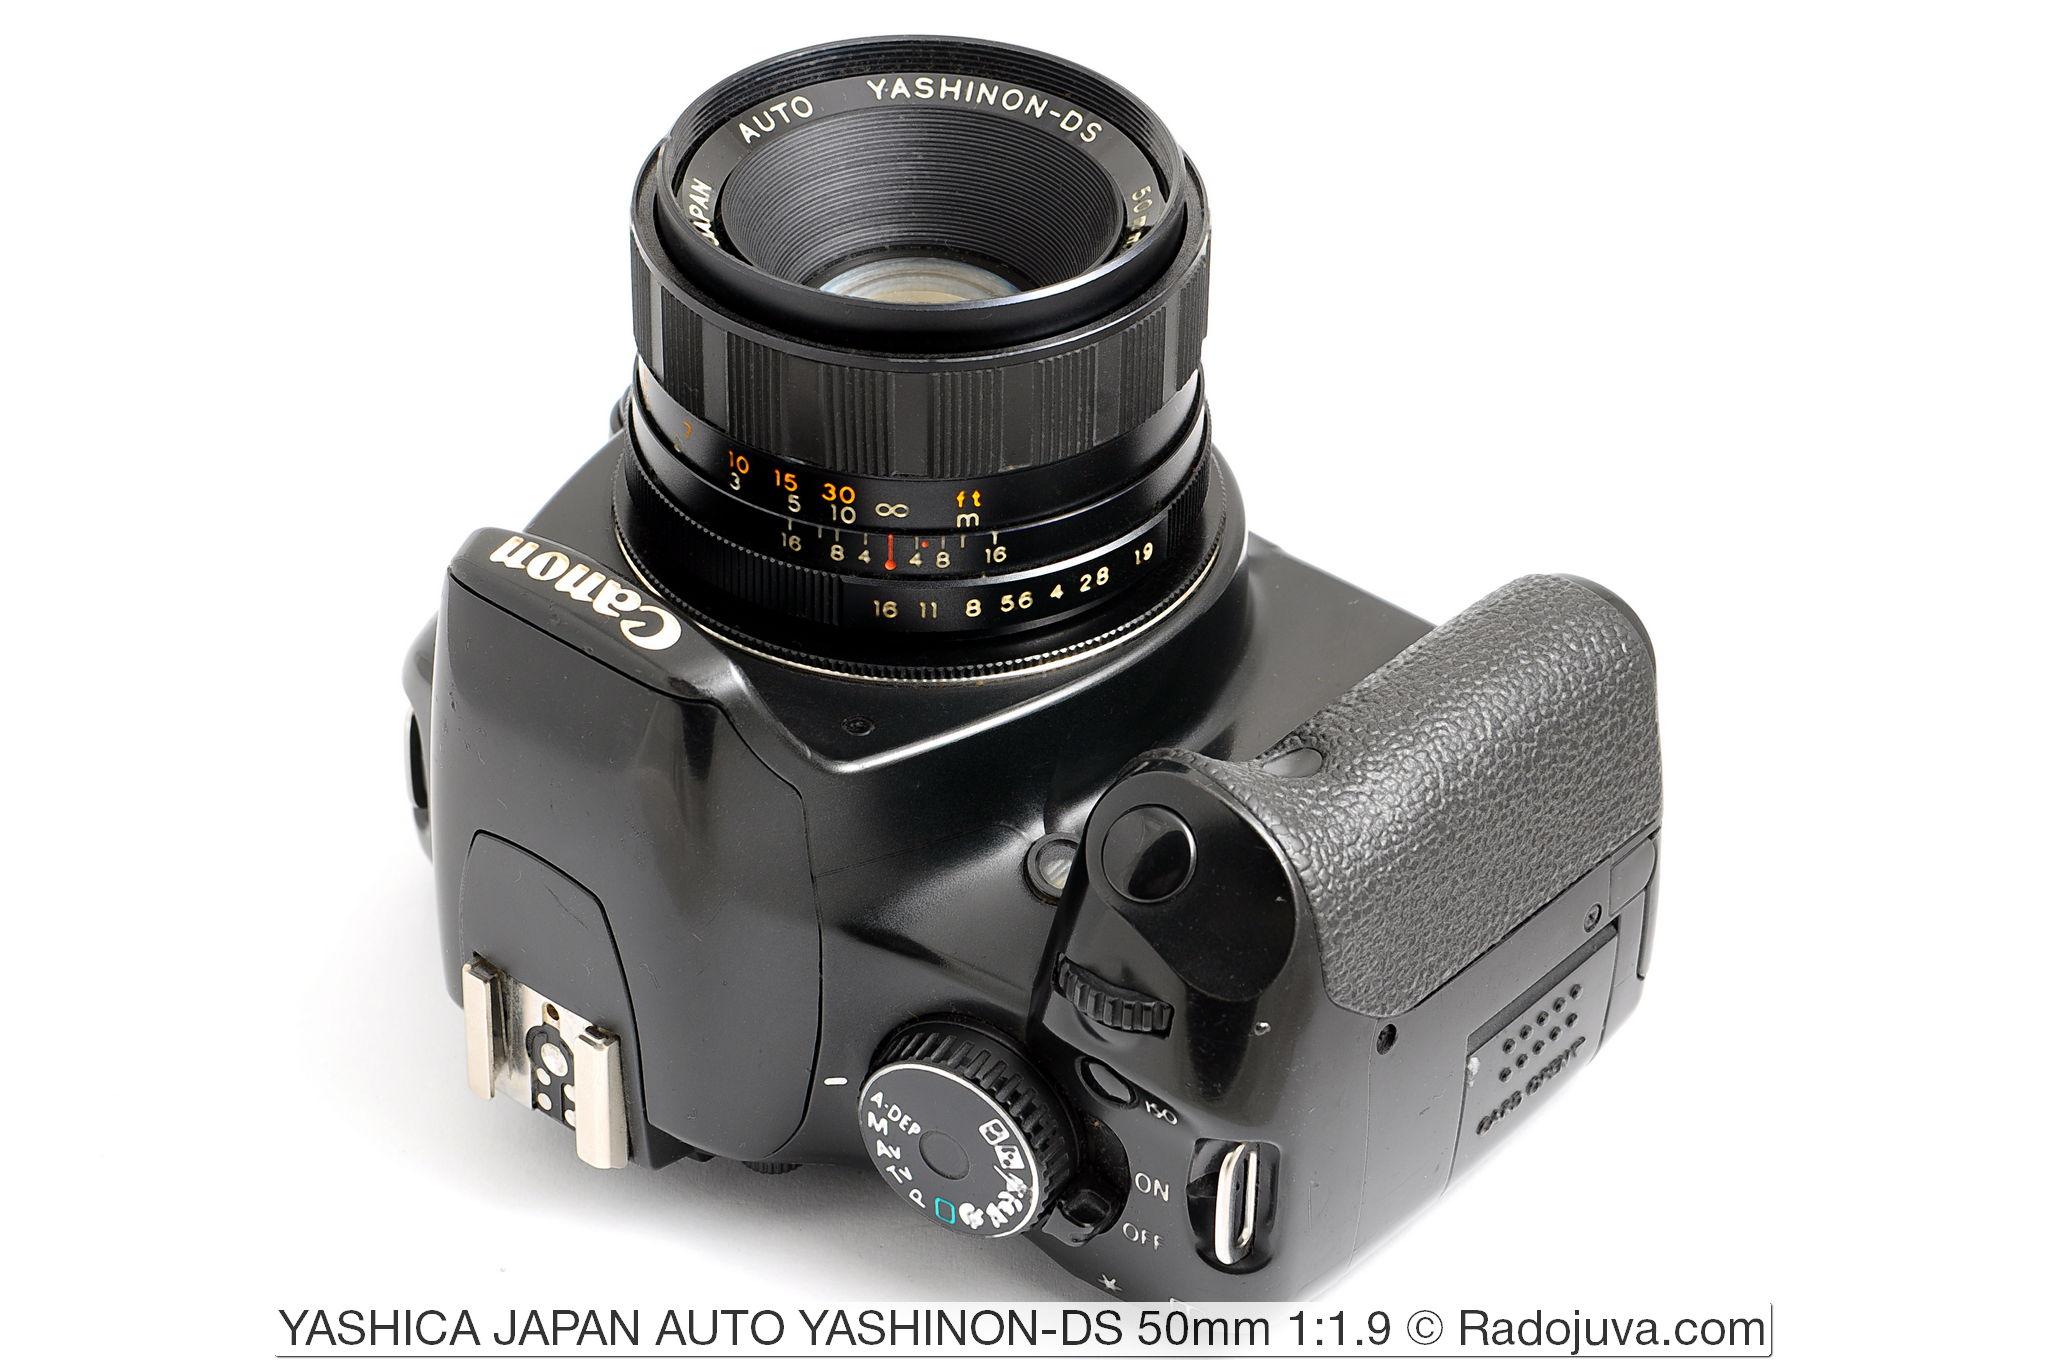 YASHICA JAPAN AUTO YASHINON-DS 50mm 1:1.9